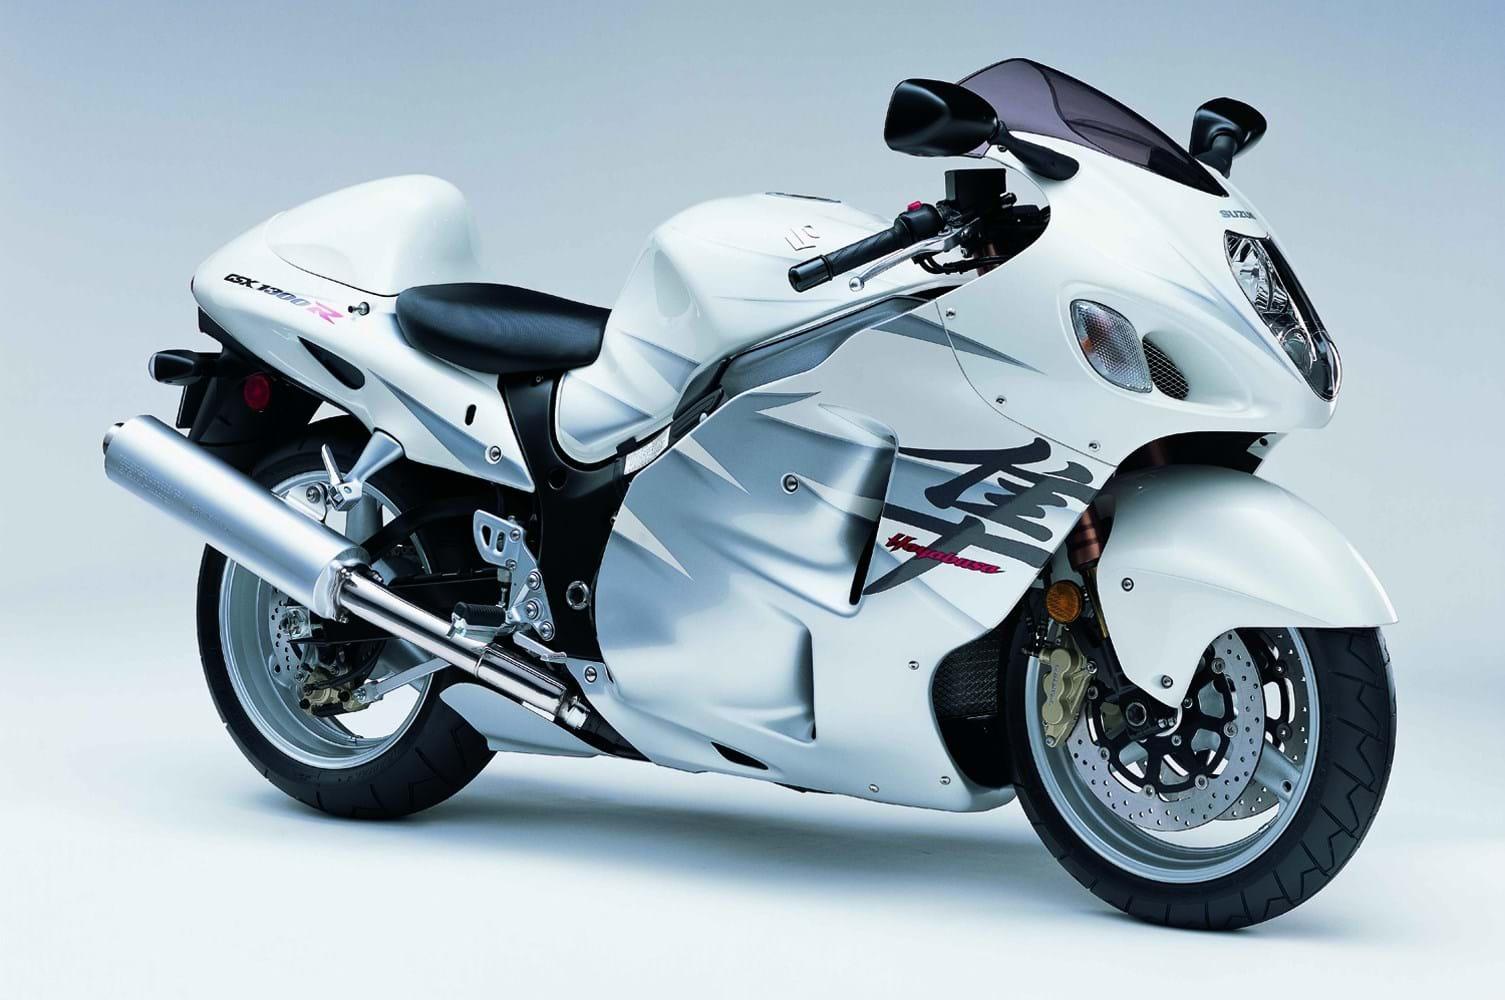 Suzuki Hayabusa Review • For Sale • Price Guide • The Bike Market